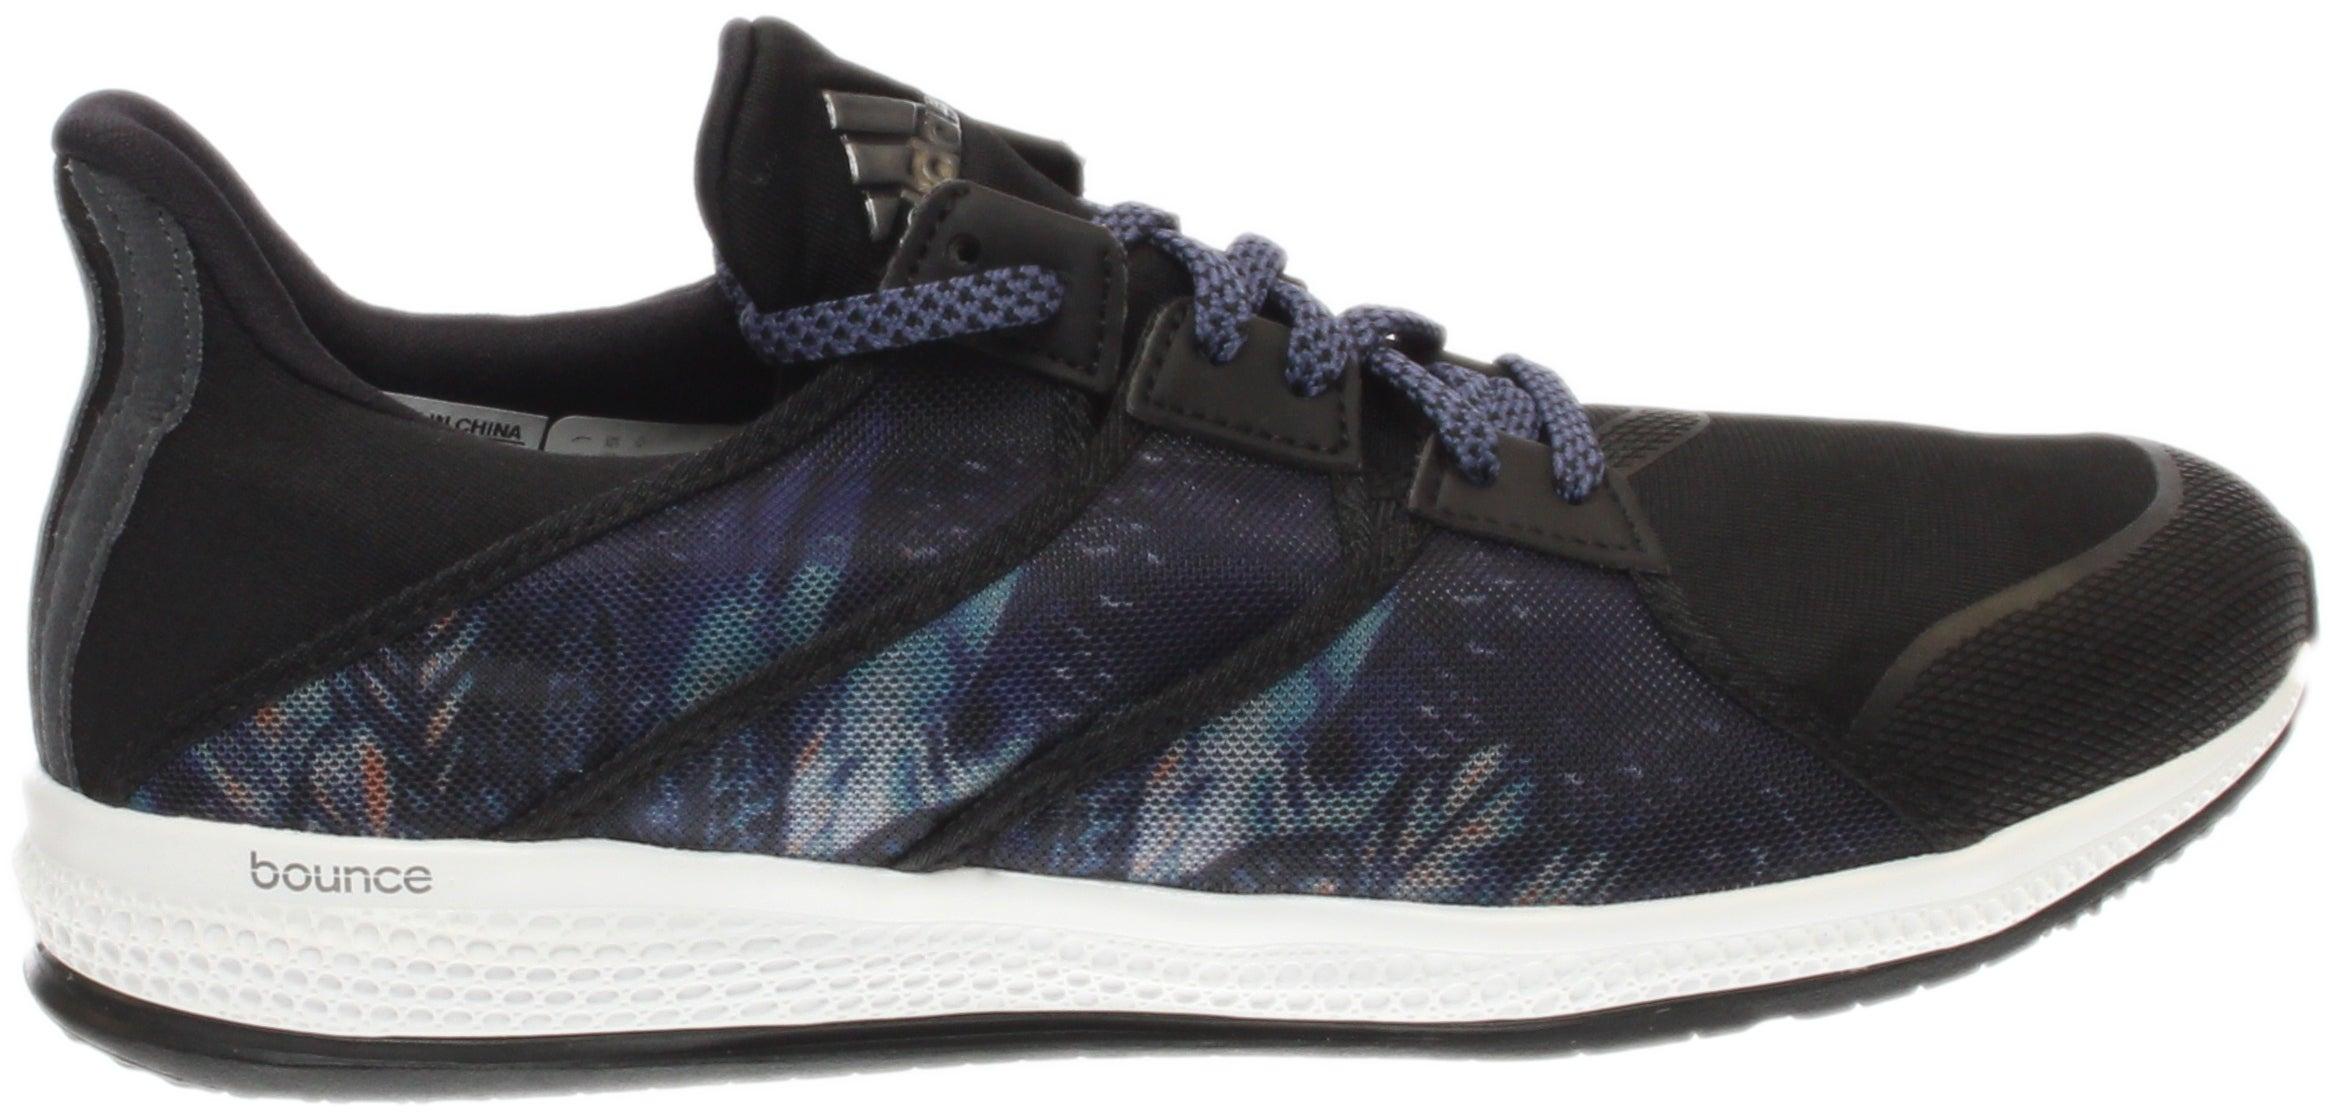 adidas Gymbreaker Bounce W Black - Womens  - Size 5.5